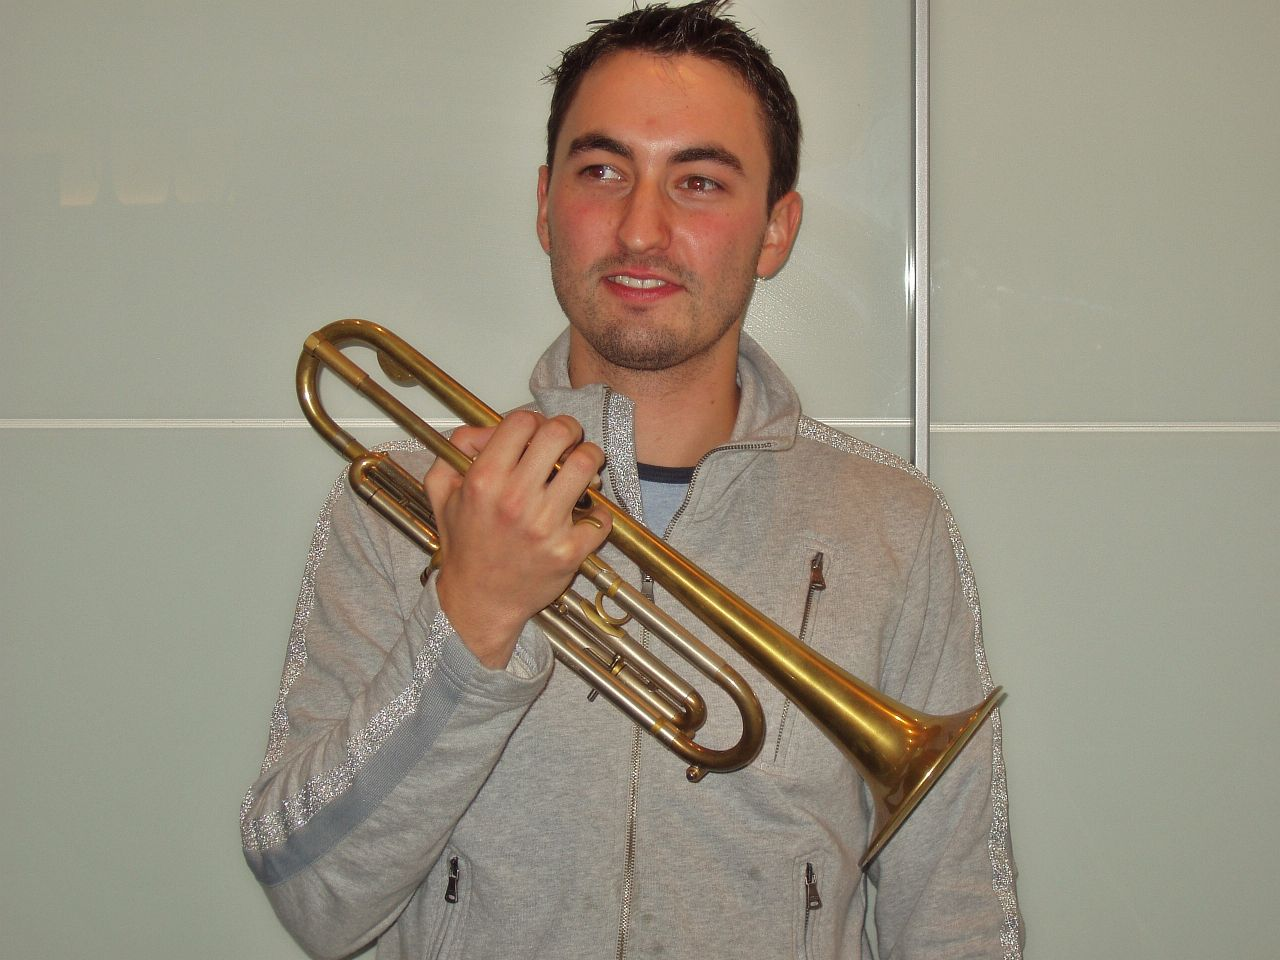 Musiker 258